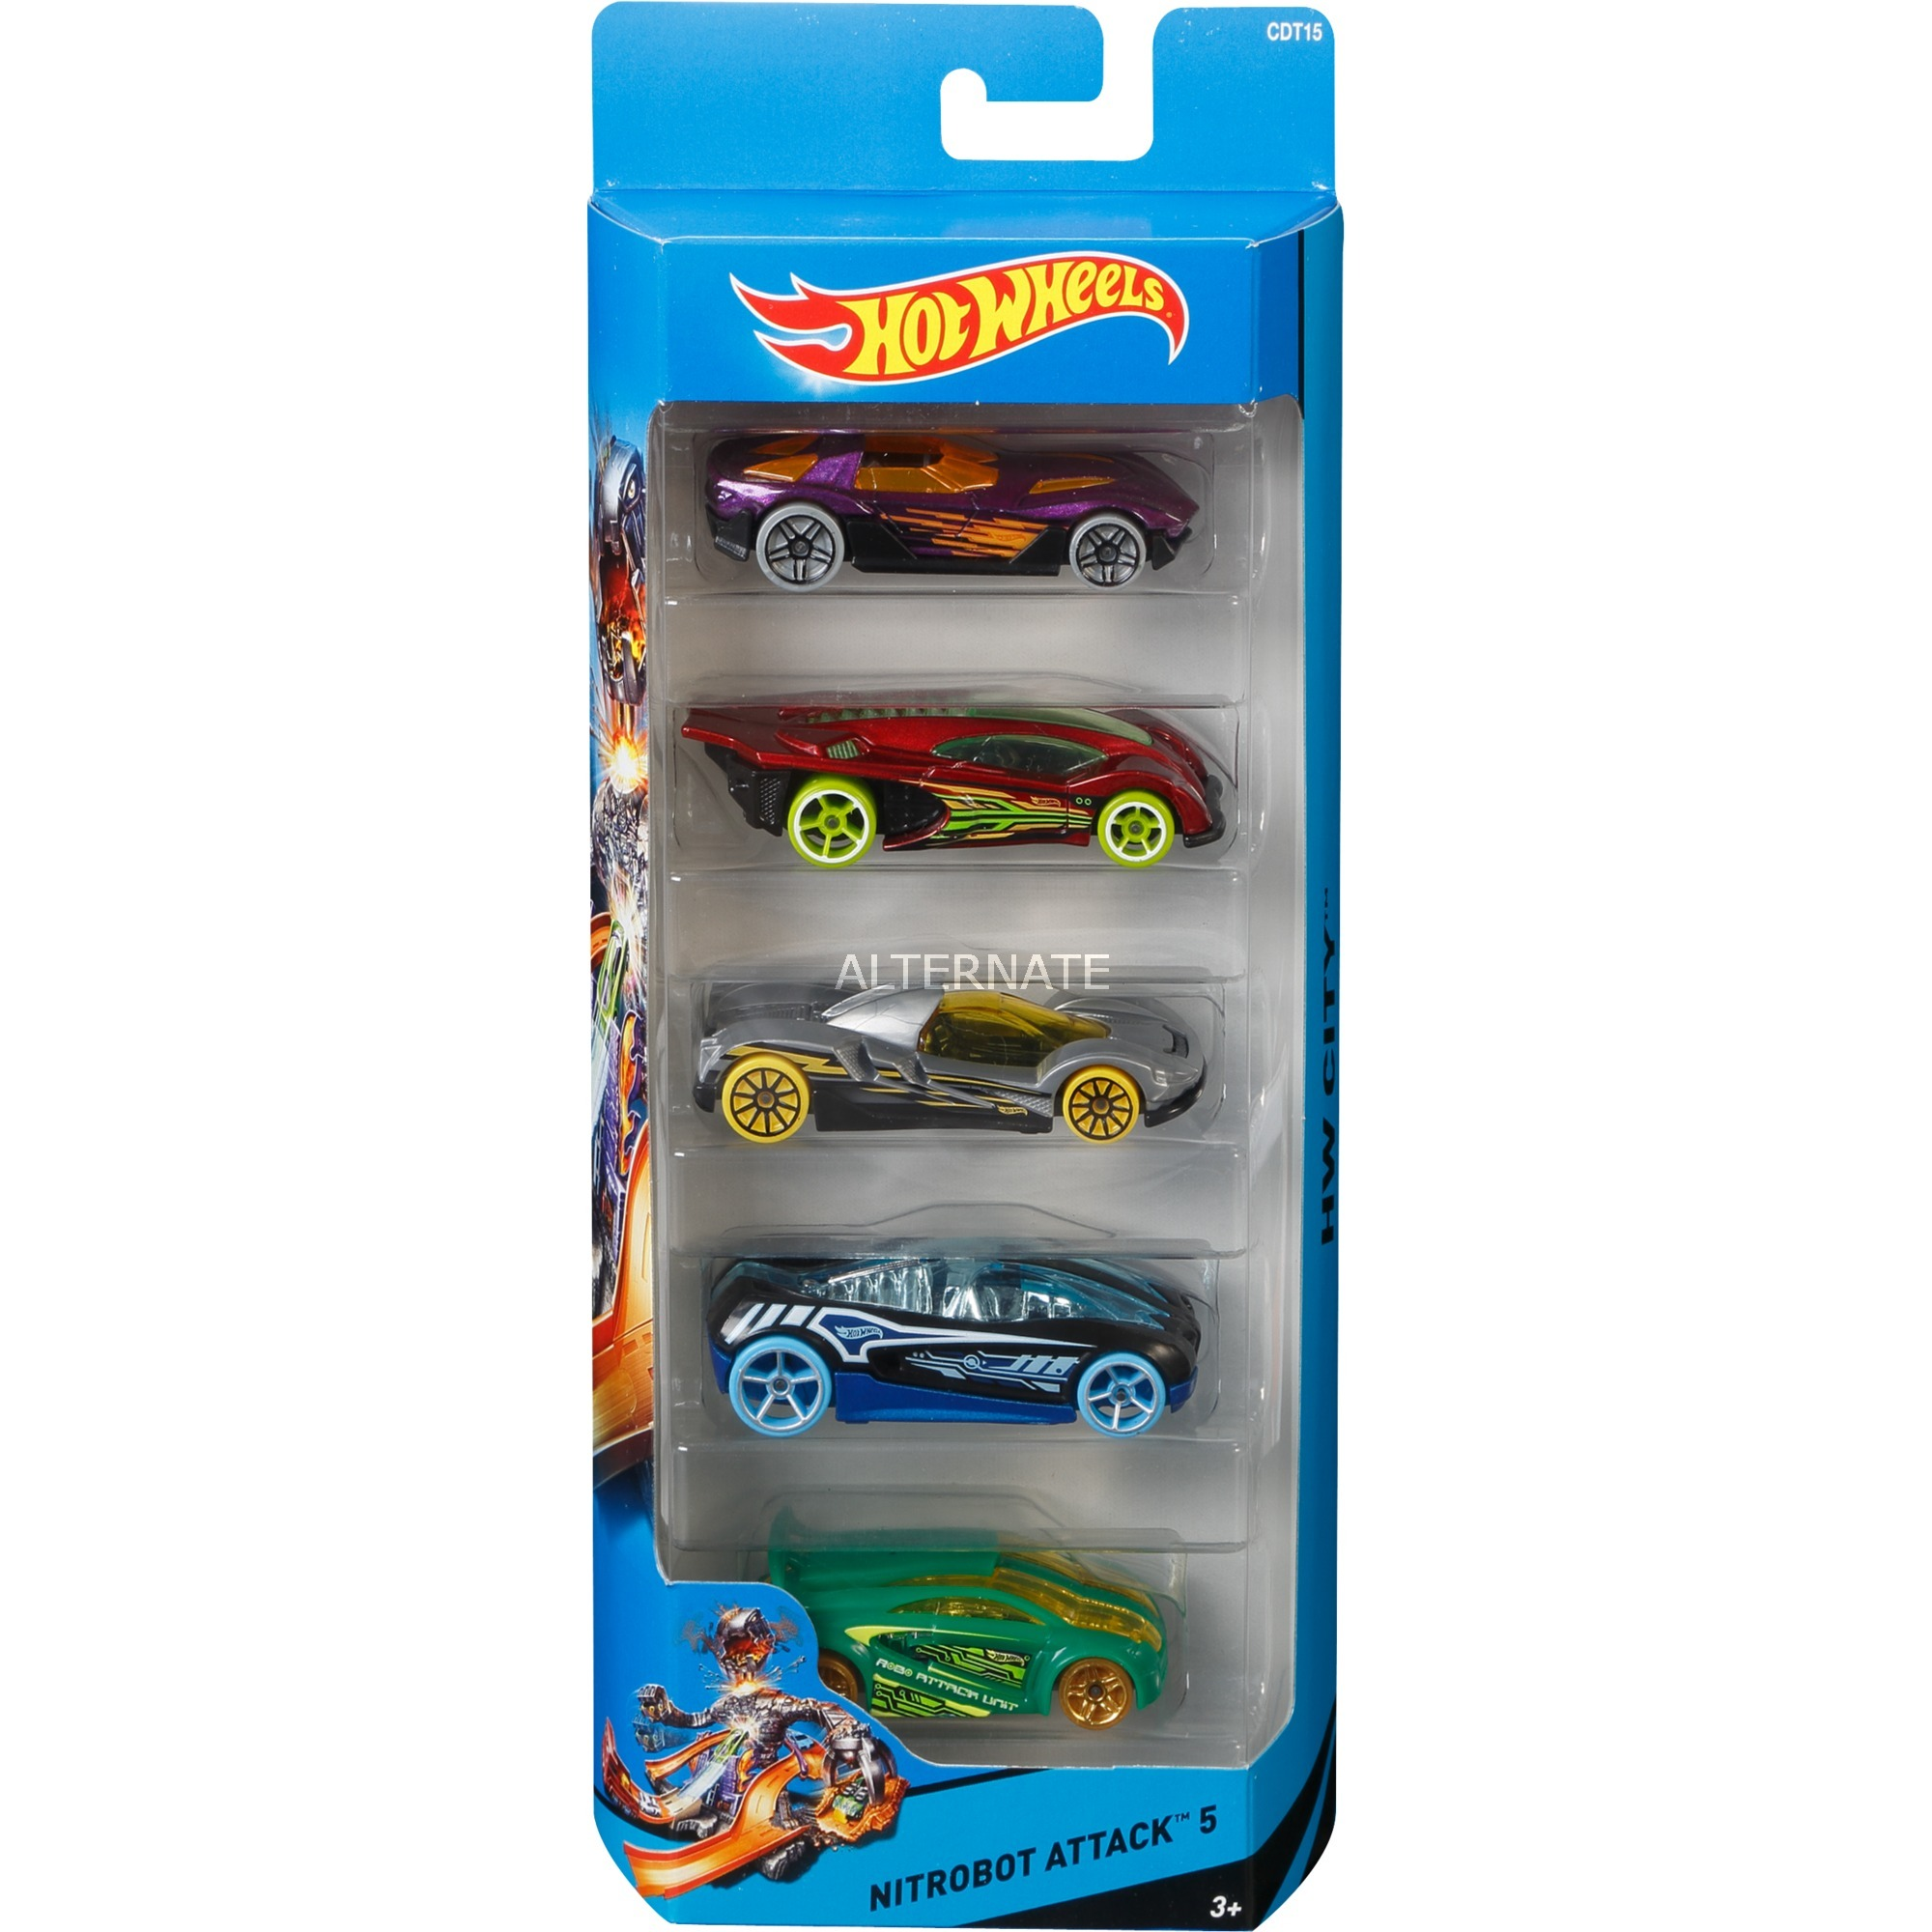 1806 modelo de juguete Car model, Vehículo de juguete